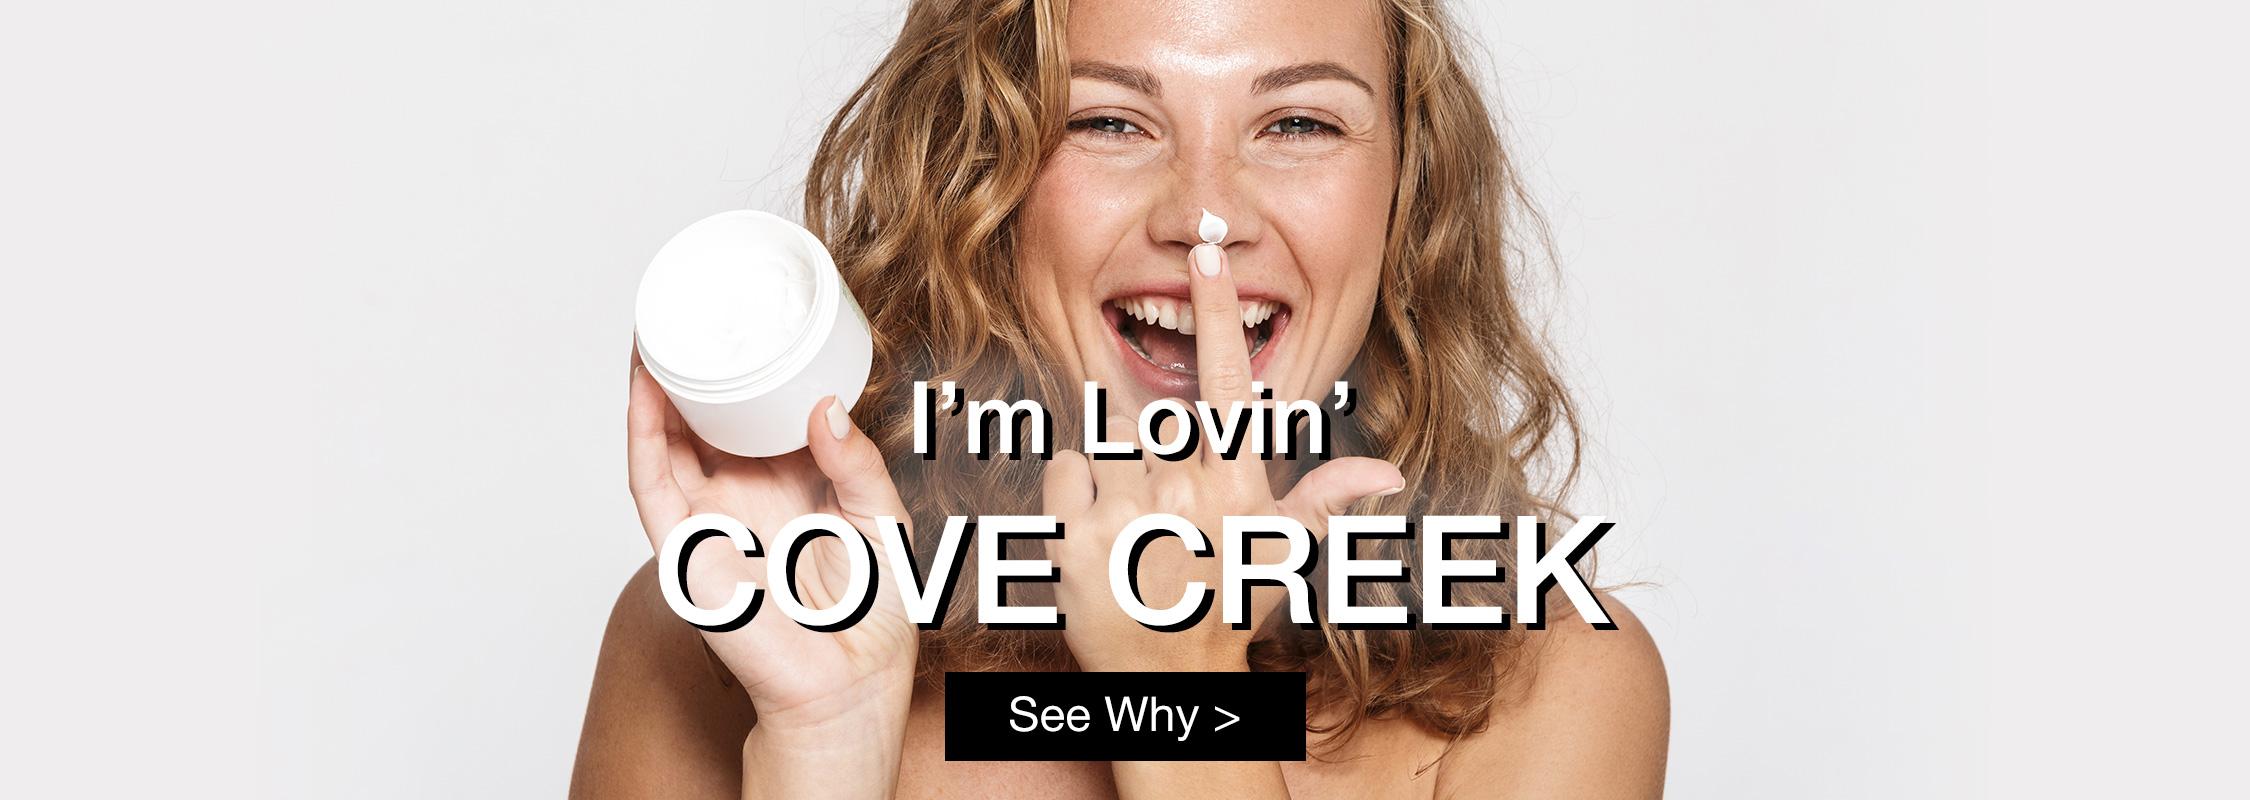 Join Cove Creek